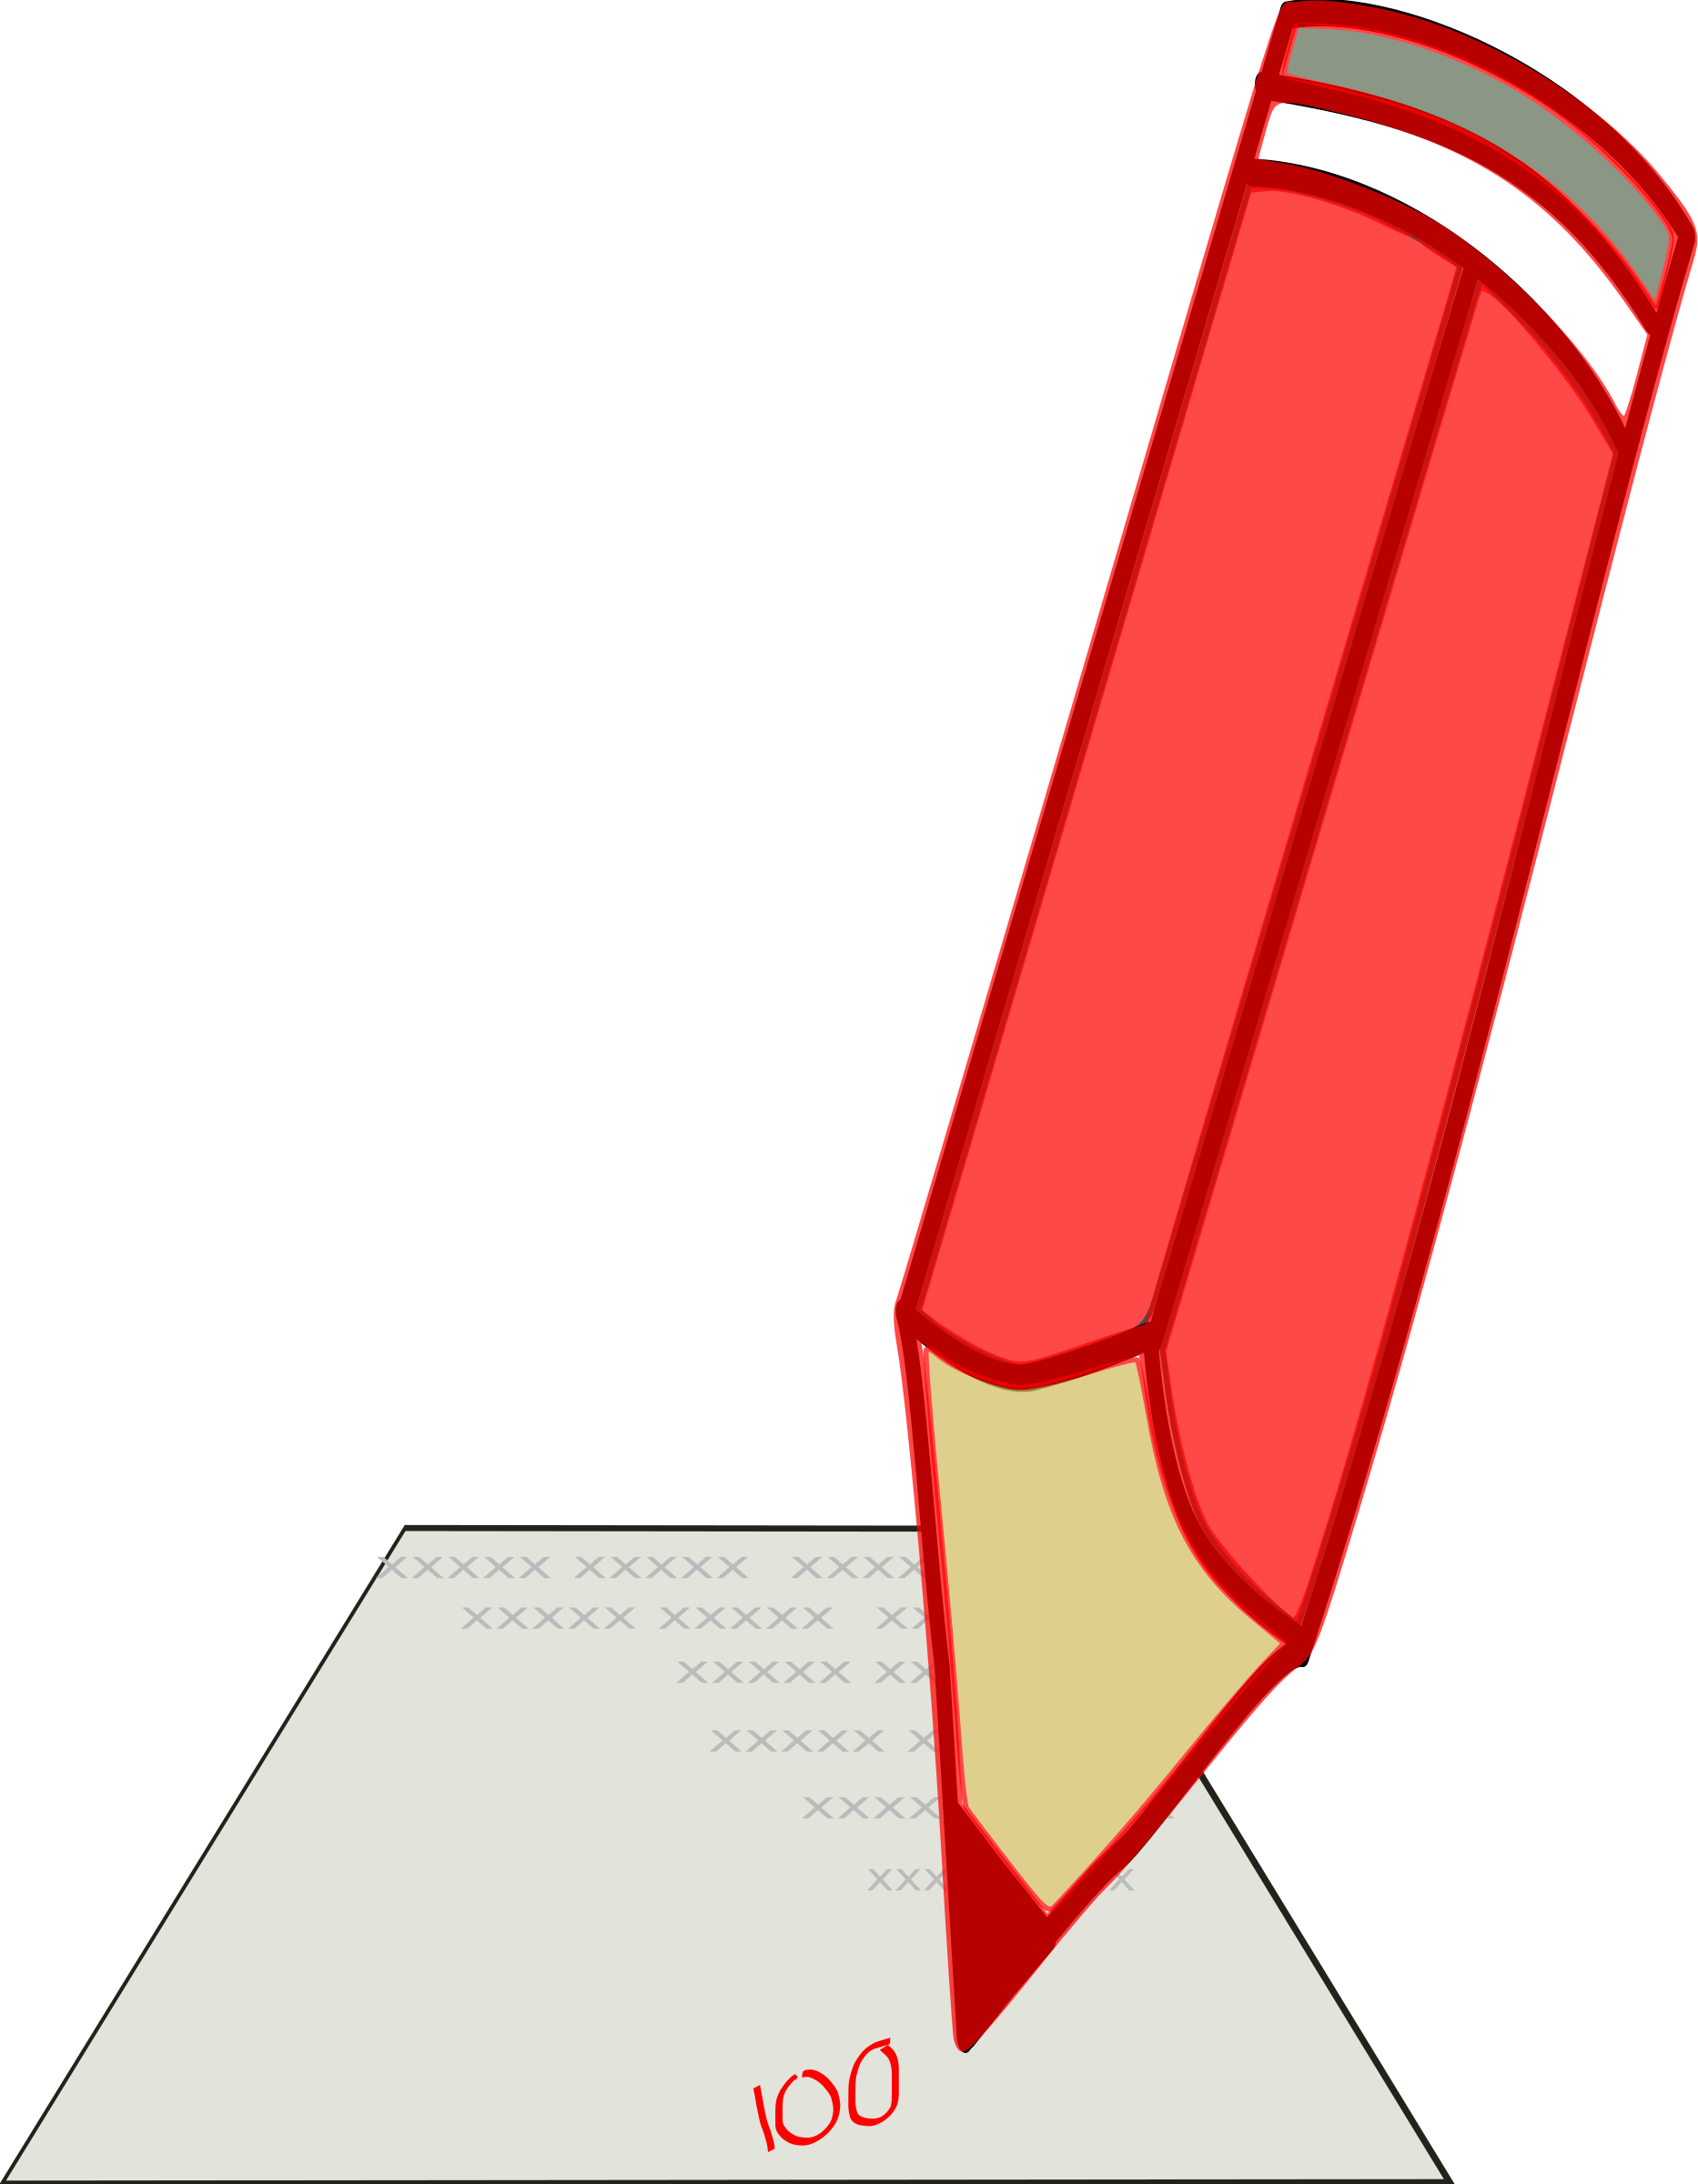 School examination clipart clipart free download Clipart - Red Pencil clipart free download